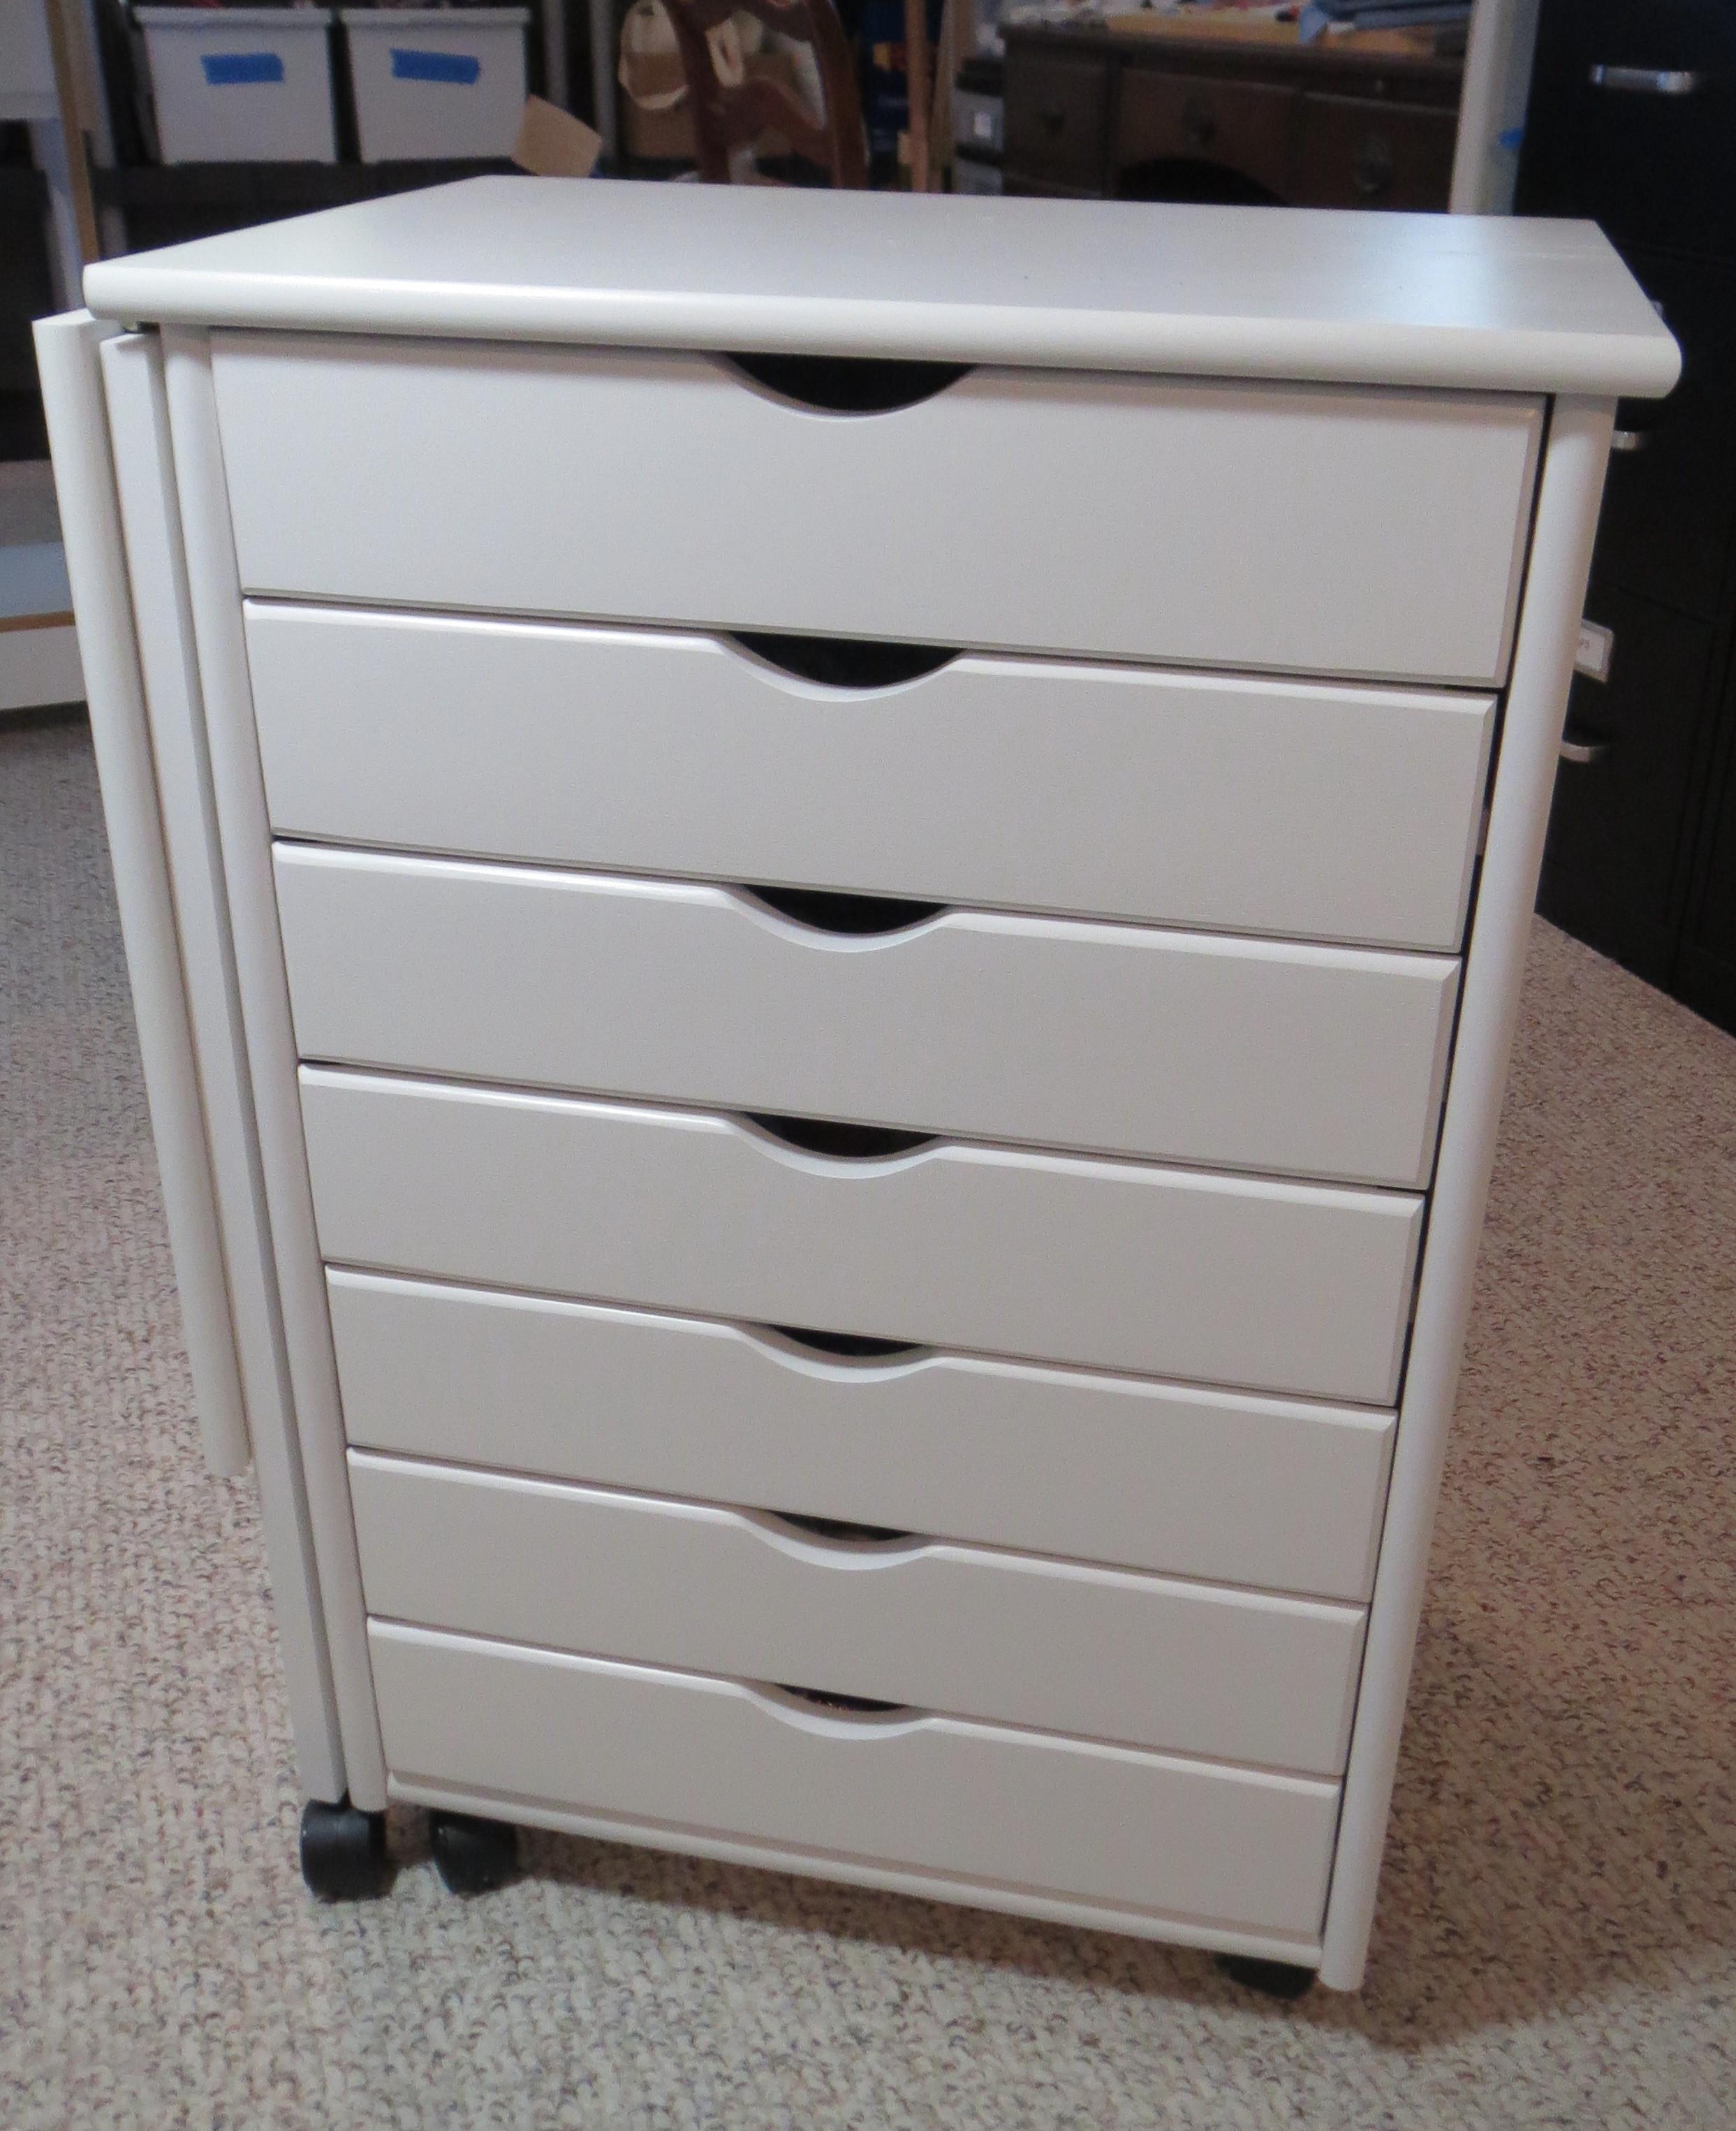 coloured honey cart crt ip storage en drawers canada do can drawer walmart multi